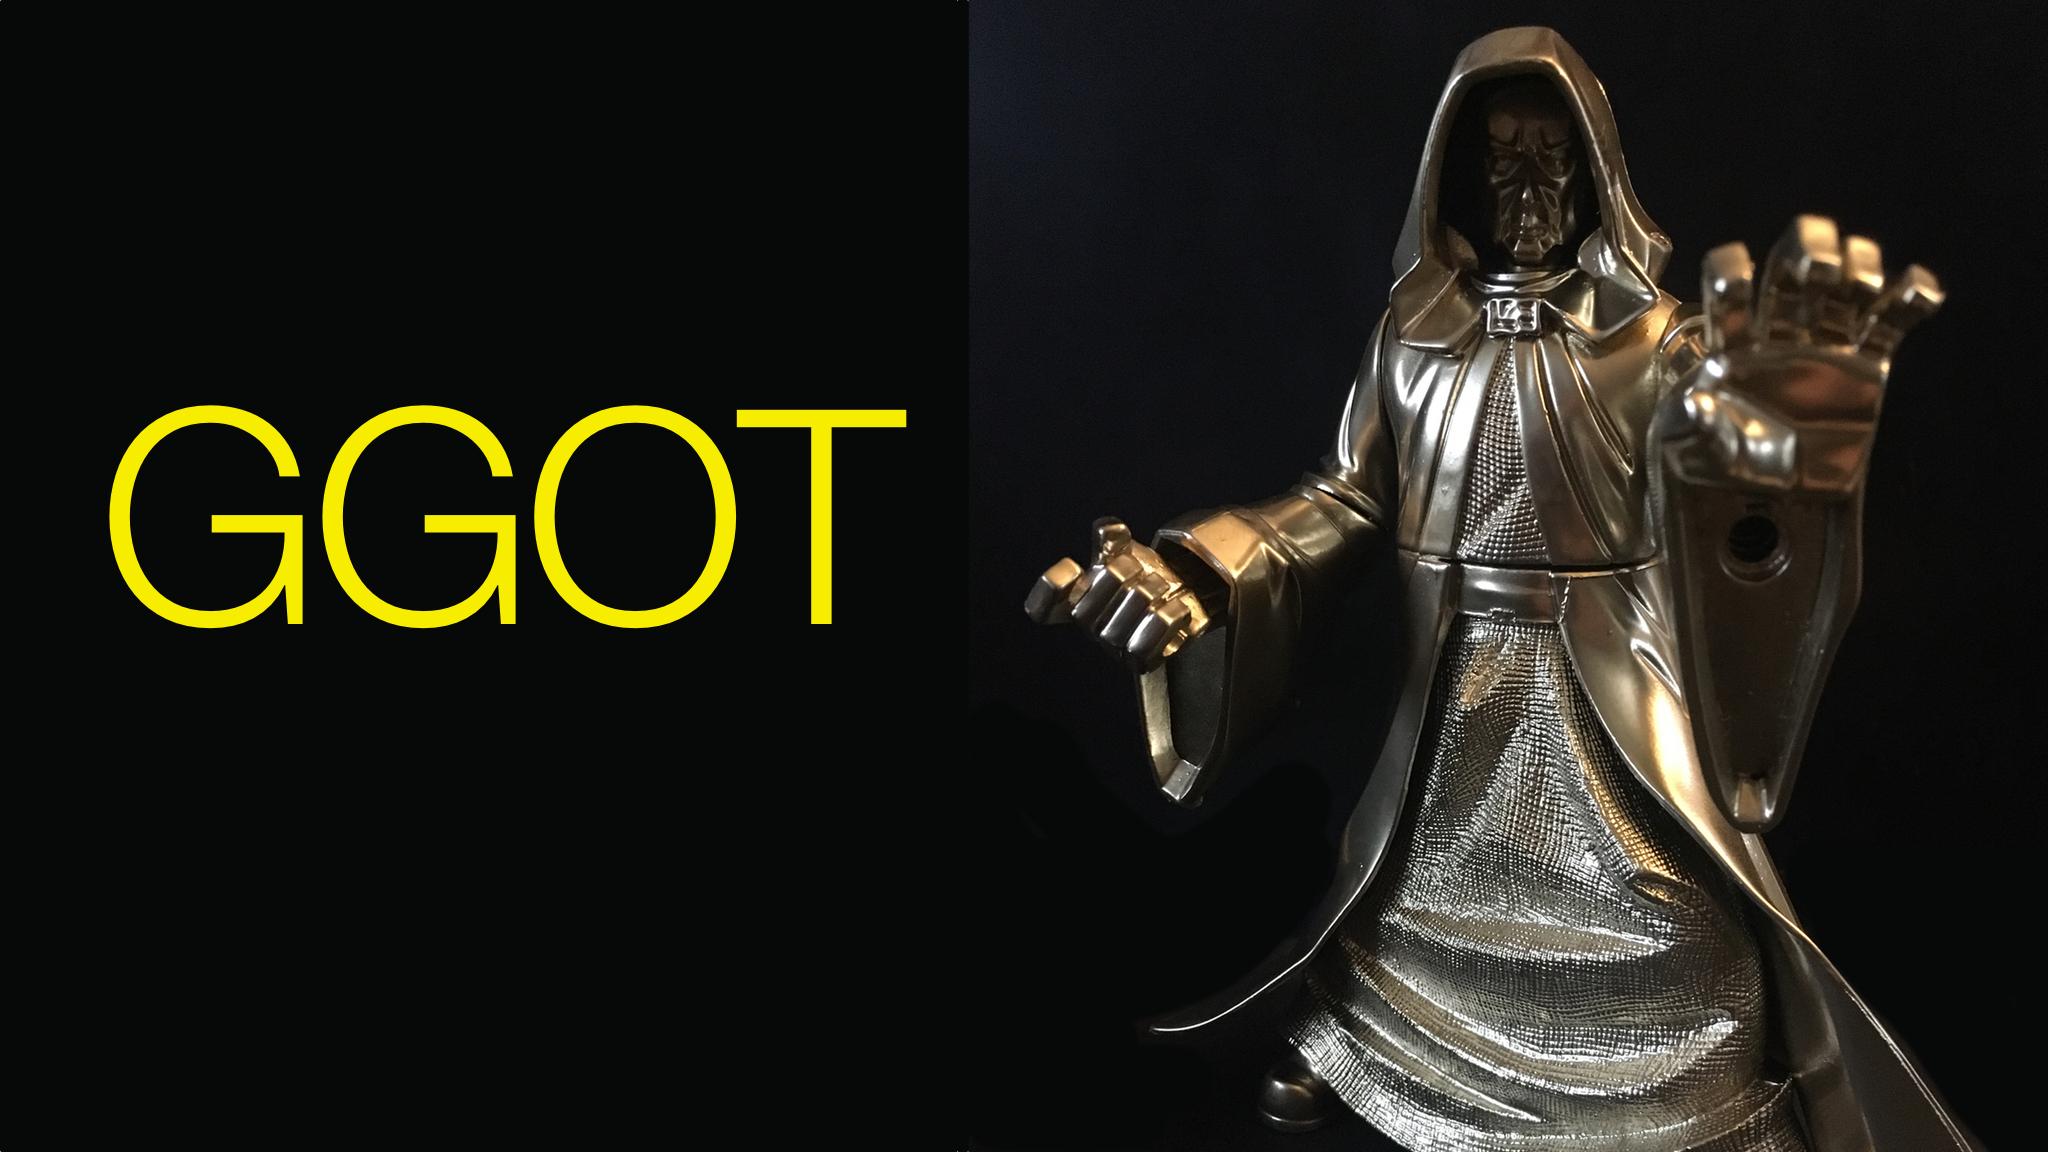 GGOT 2048X1152.jpg